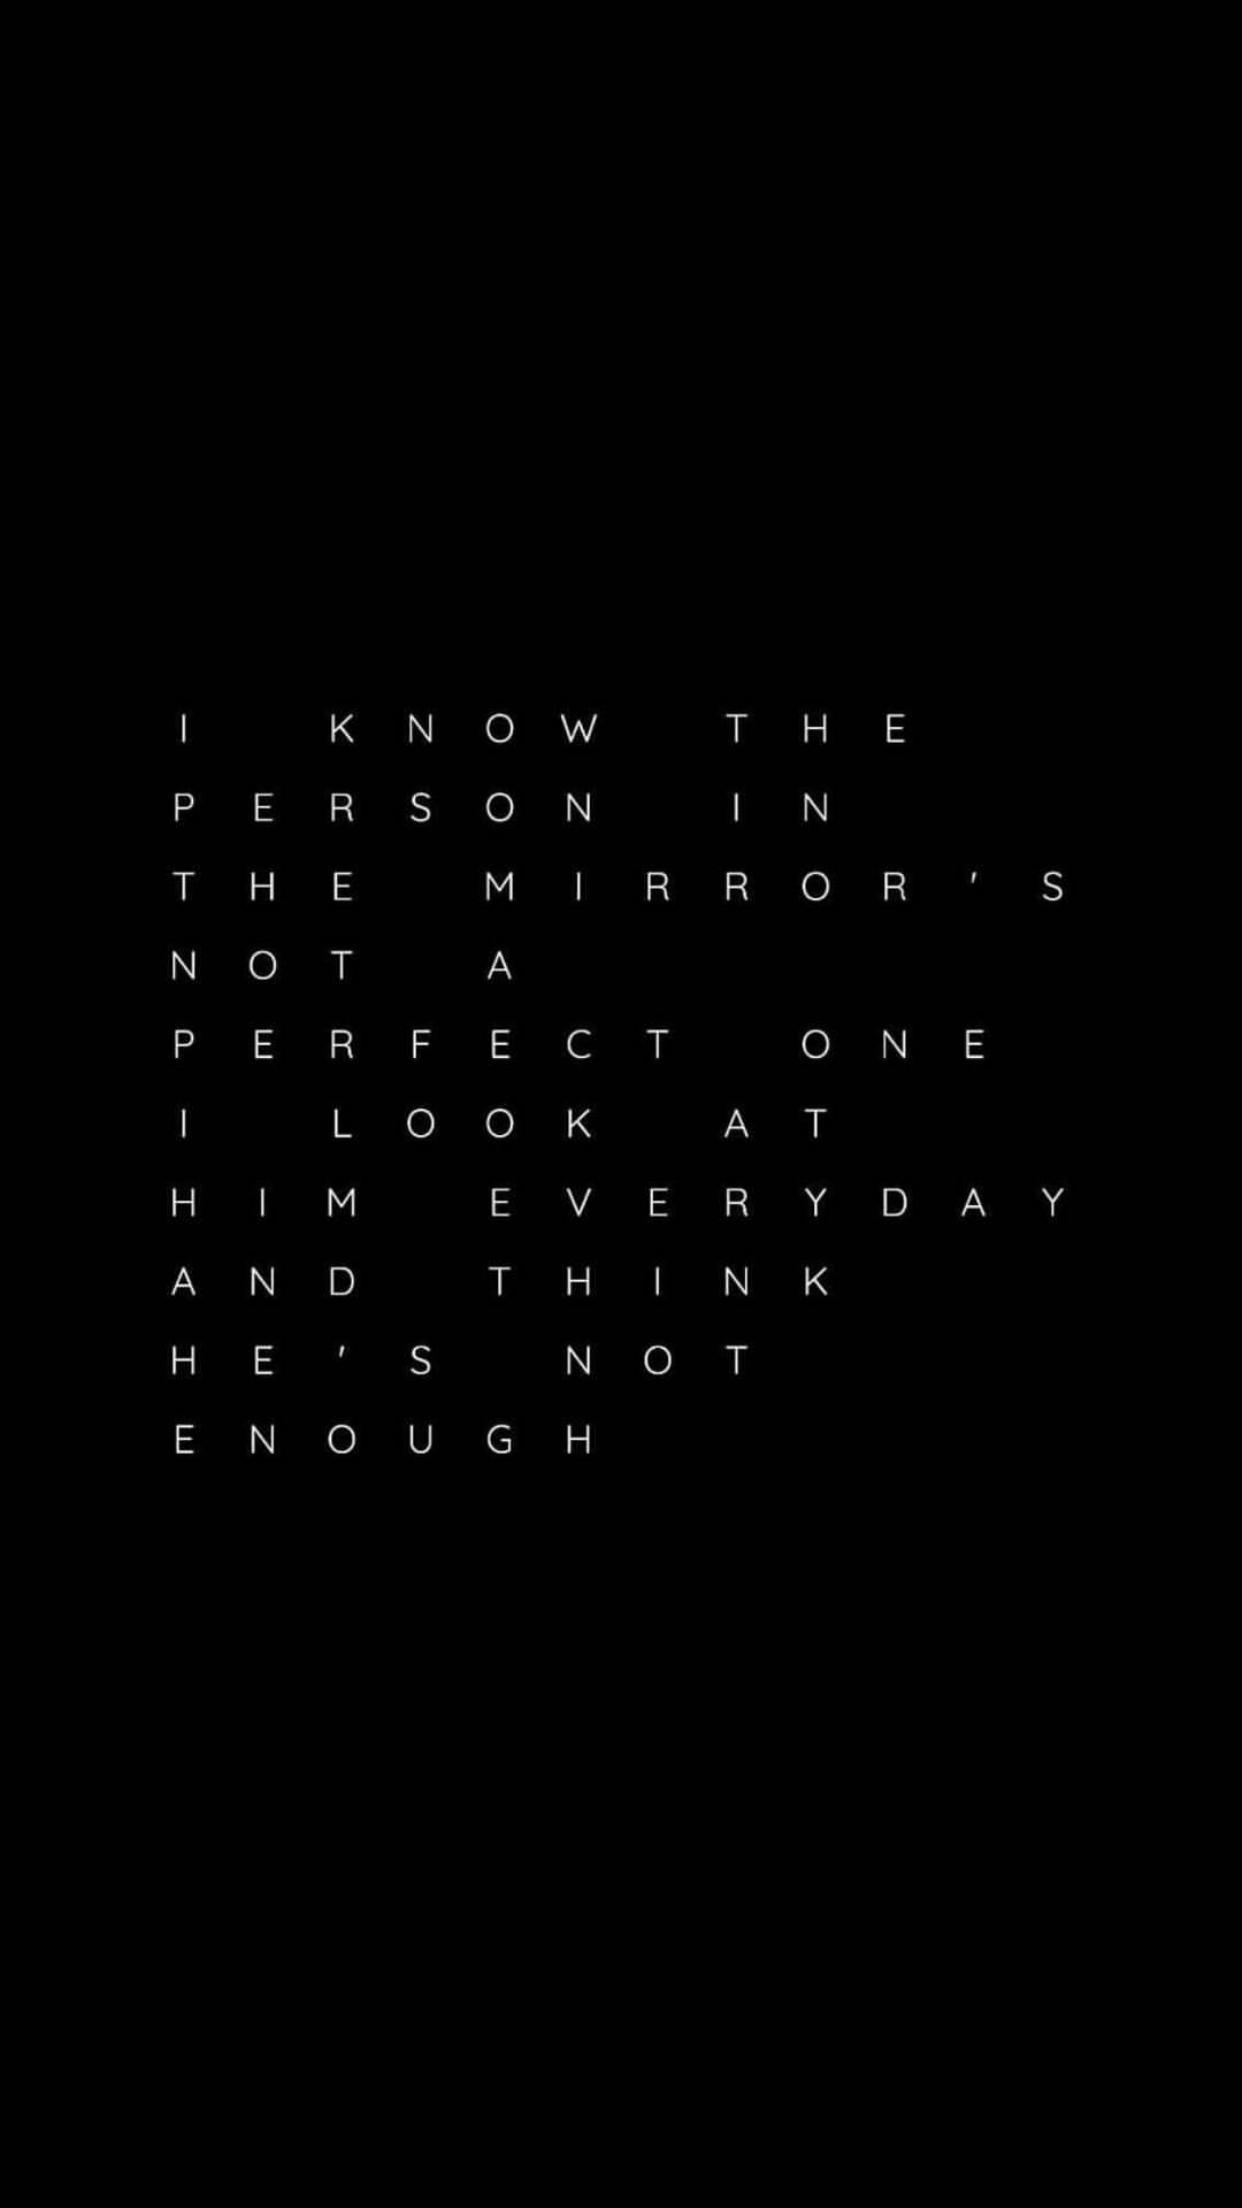 Prison Doors Lyrics Some Lyrics From A Few Of My Songsu2026dark